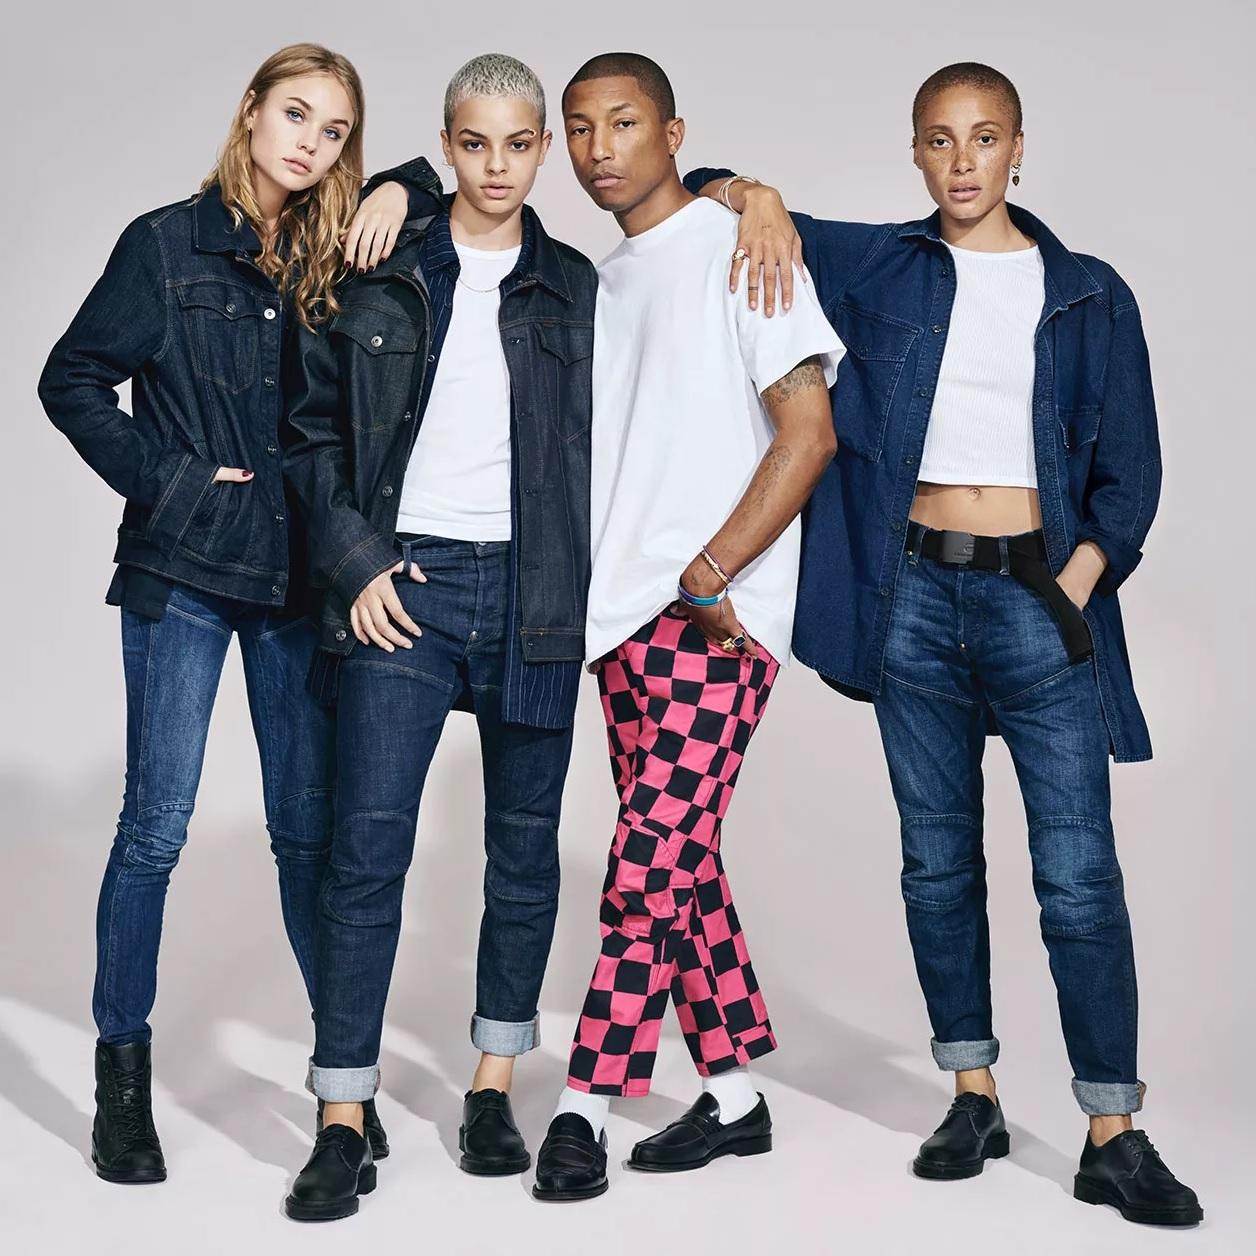 jeans | Soldes G Star Raw avec Mode Shop ! | Page 25